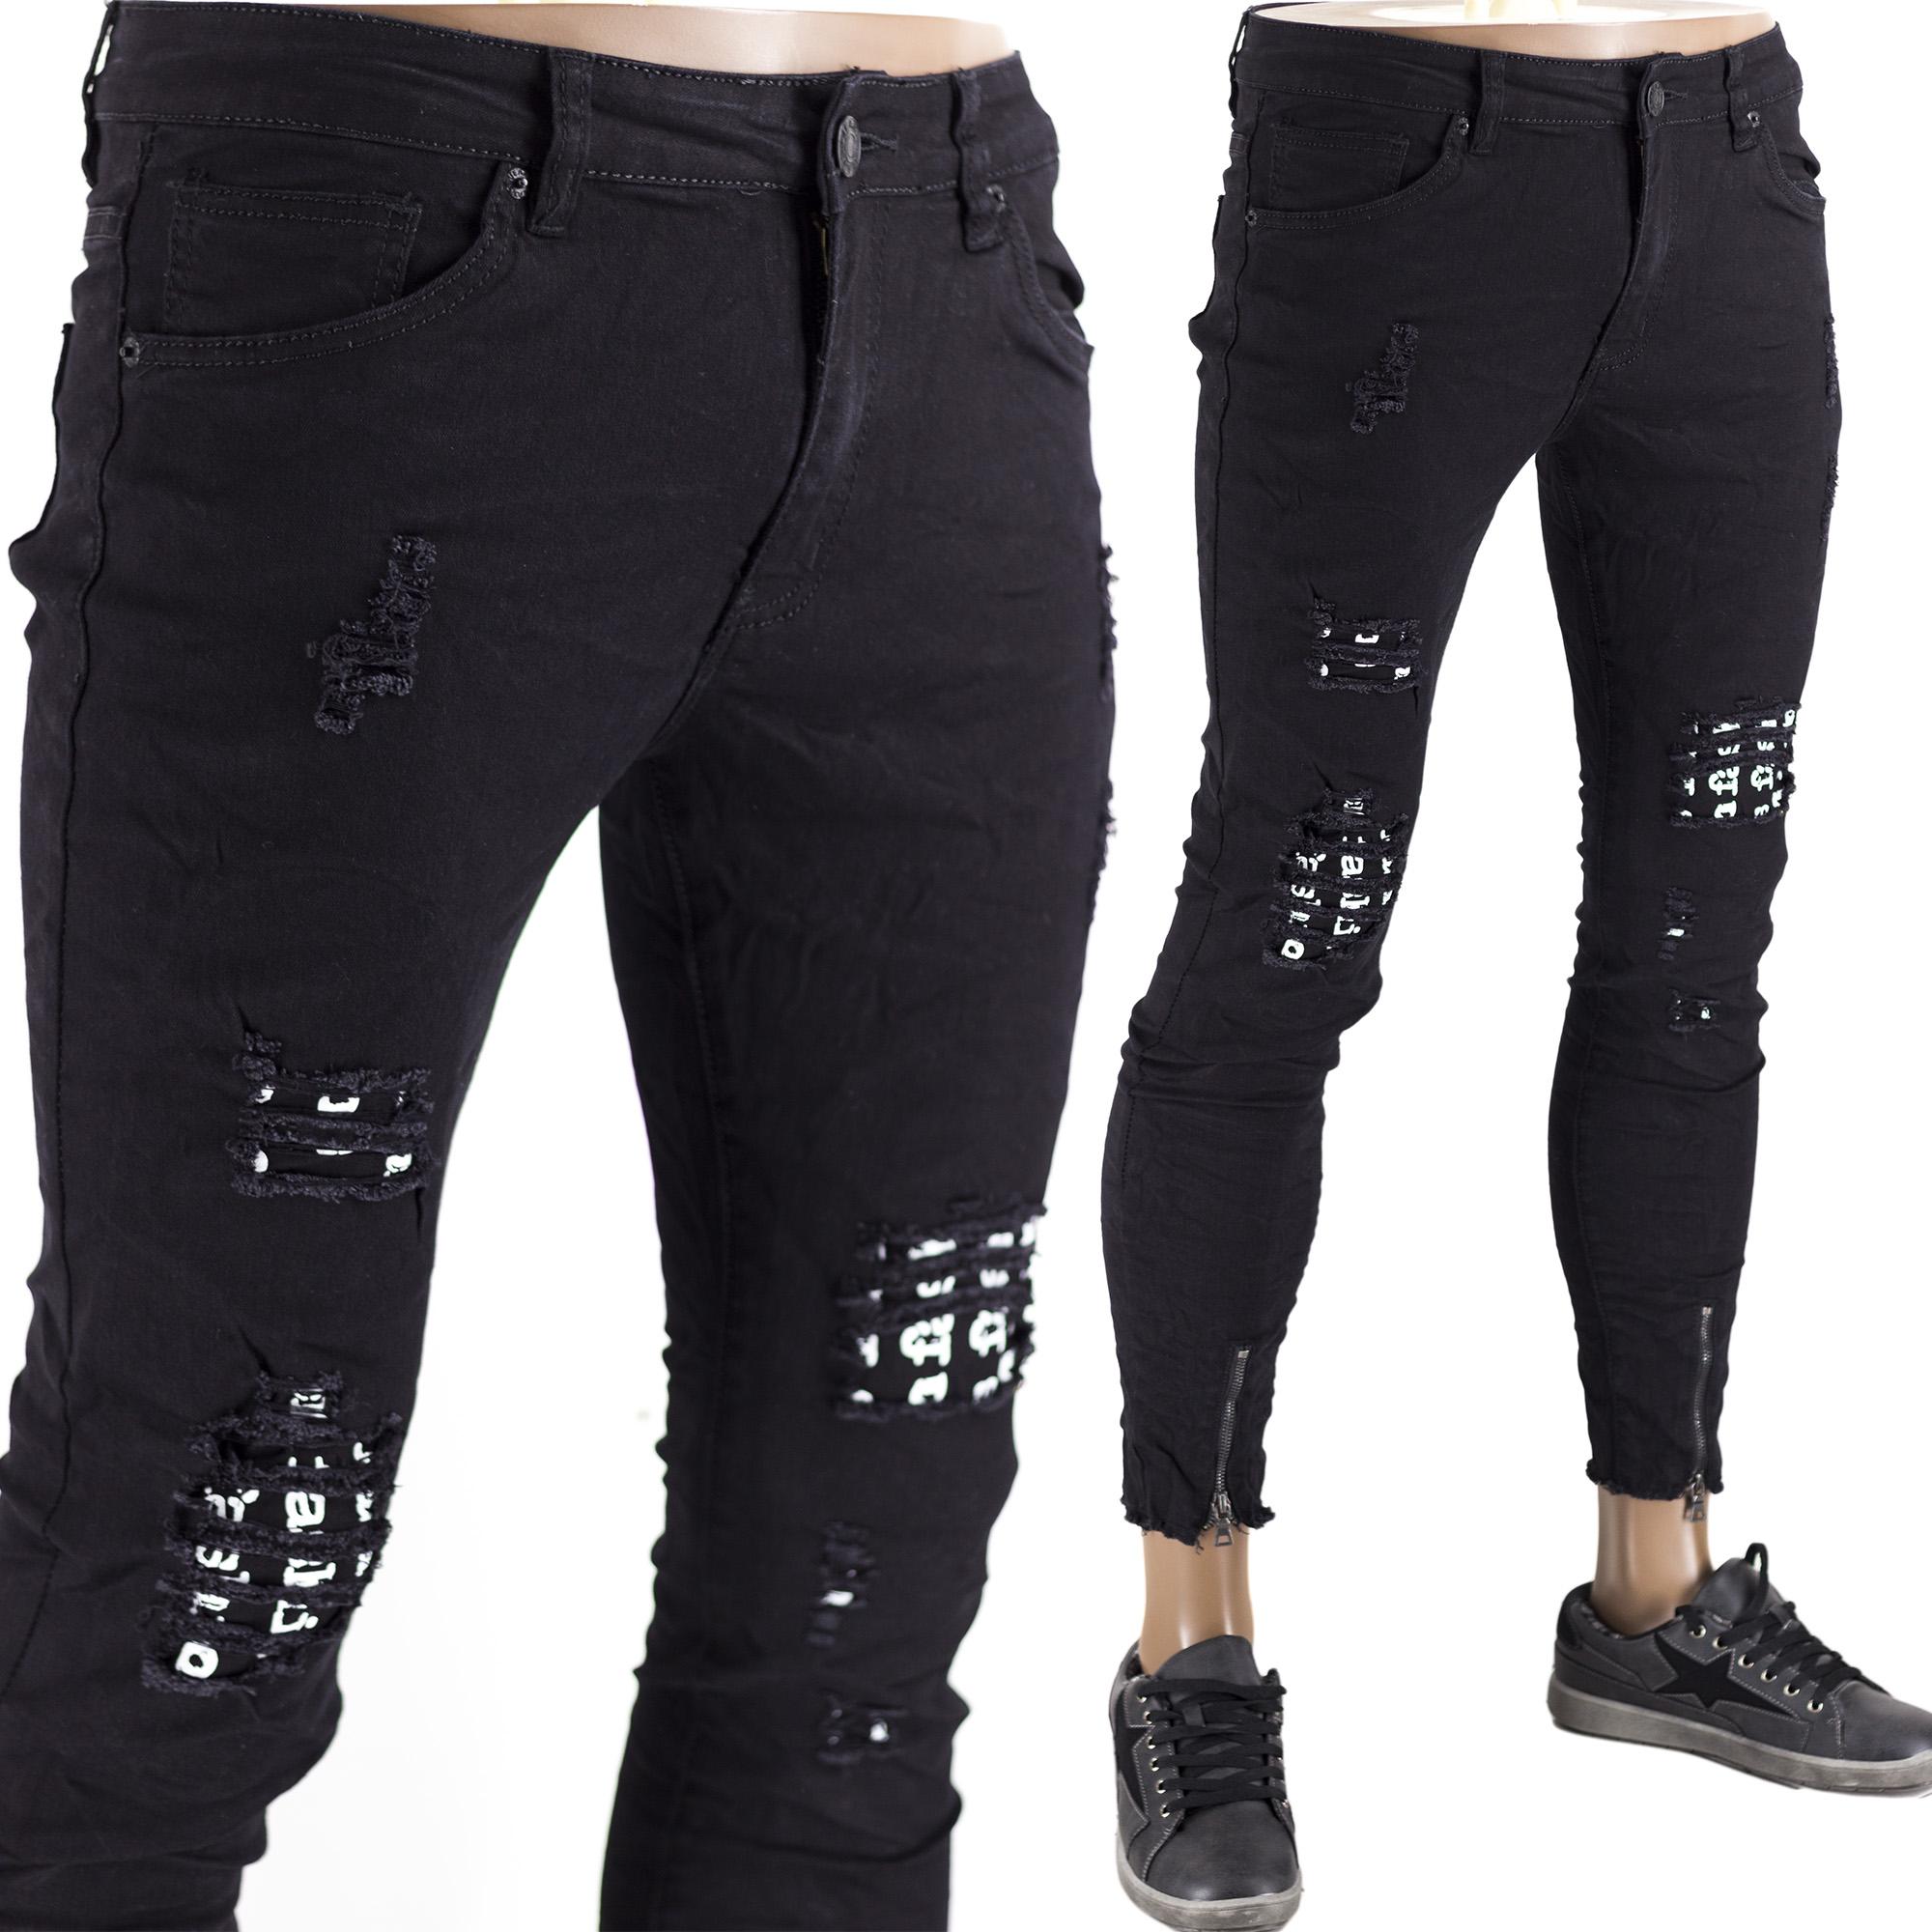 Jeans Uomo Pantaloni strappati Casual Slim jeans strappi  pantalone elastico